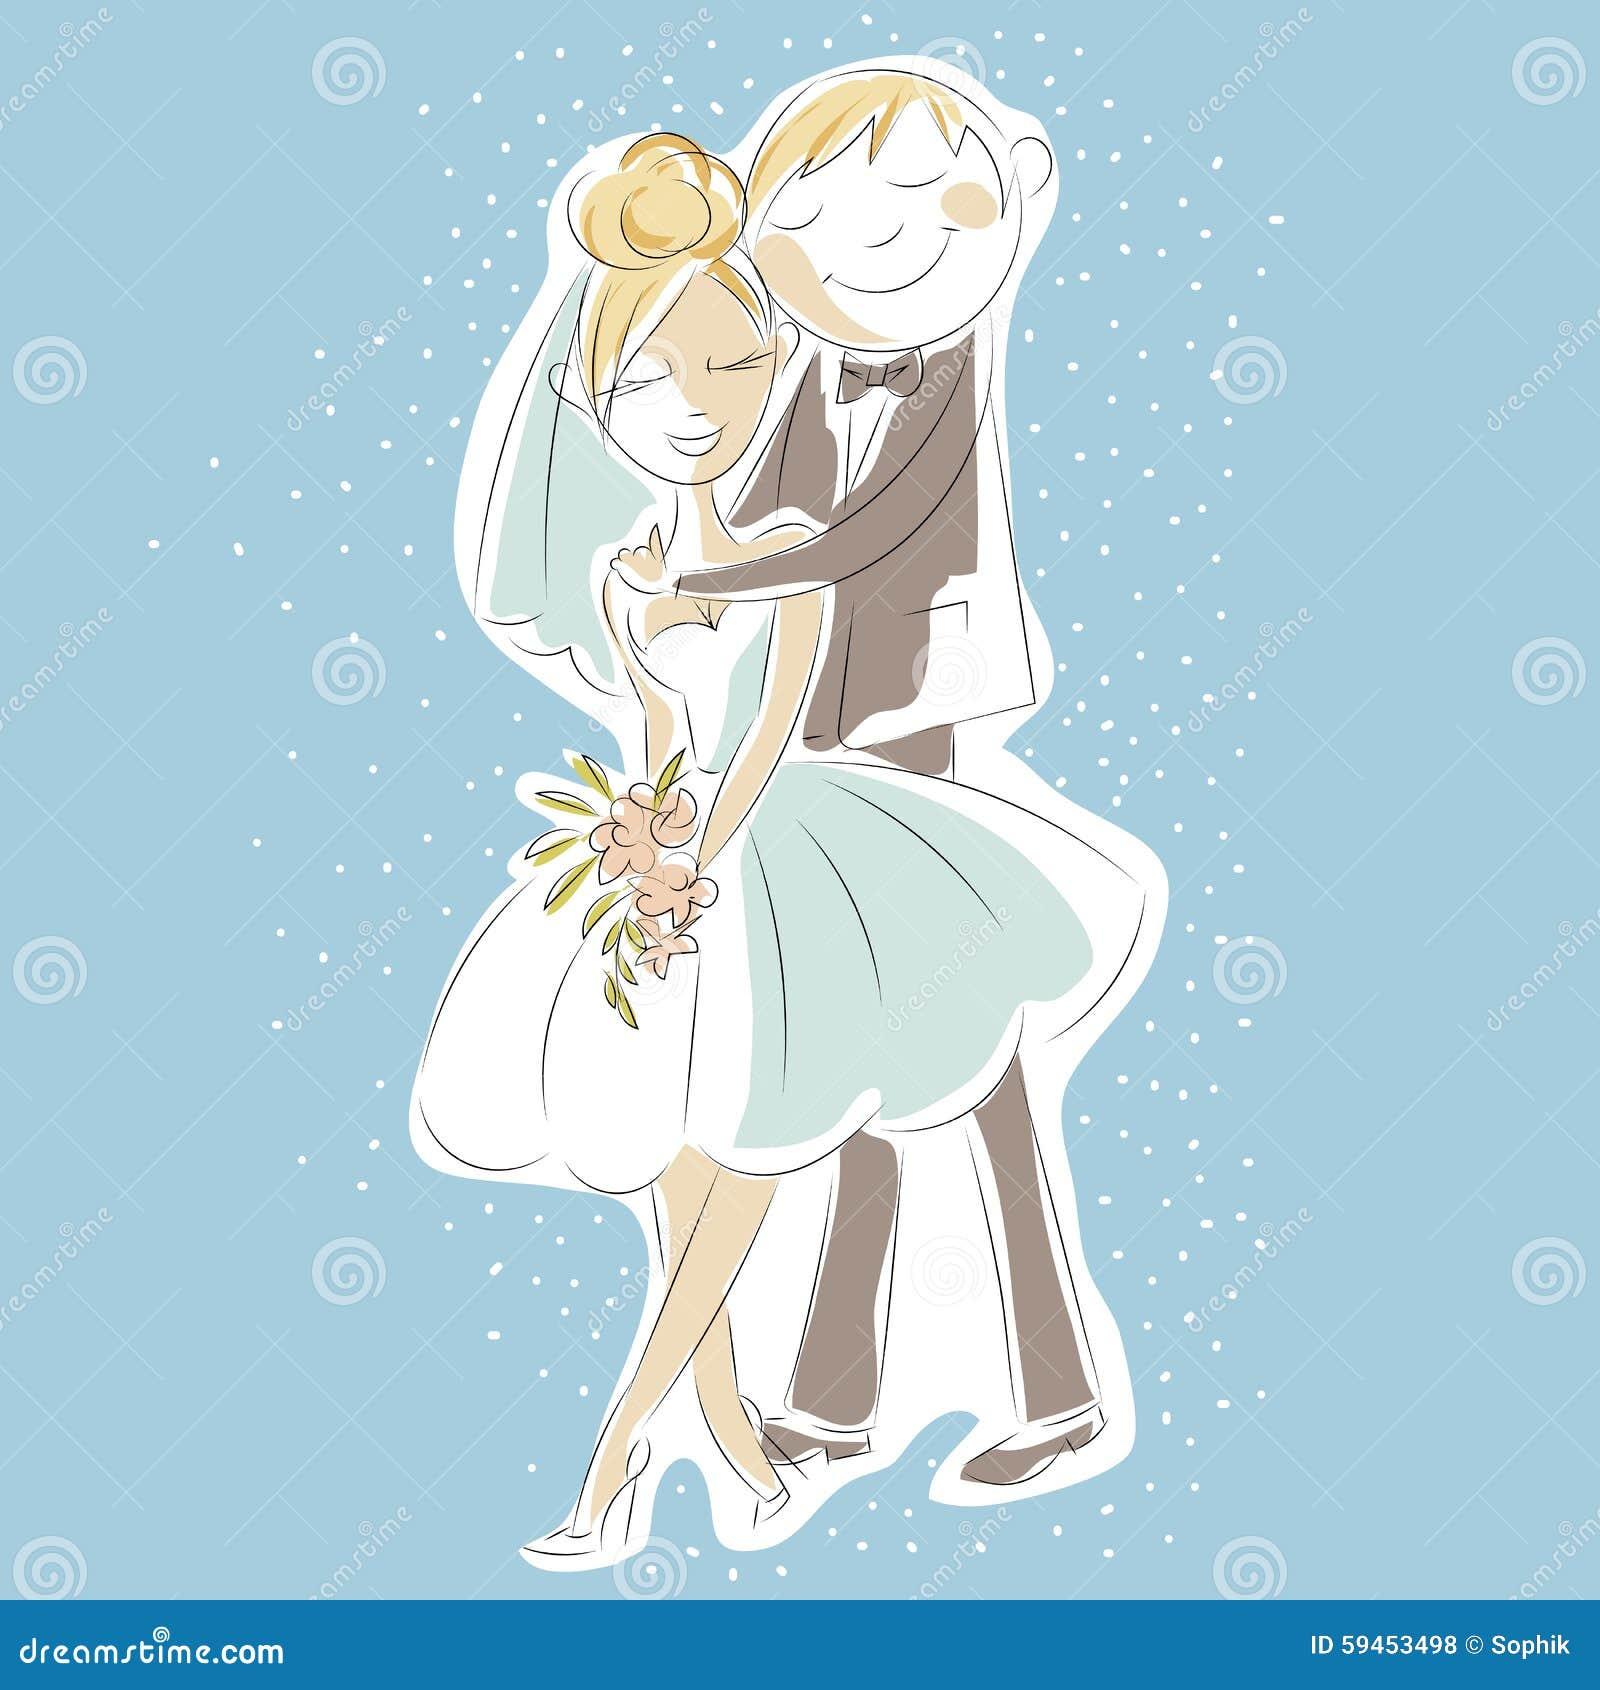 Wedding Day Invitation With Sweet Couple, Cartoon Bride